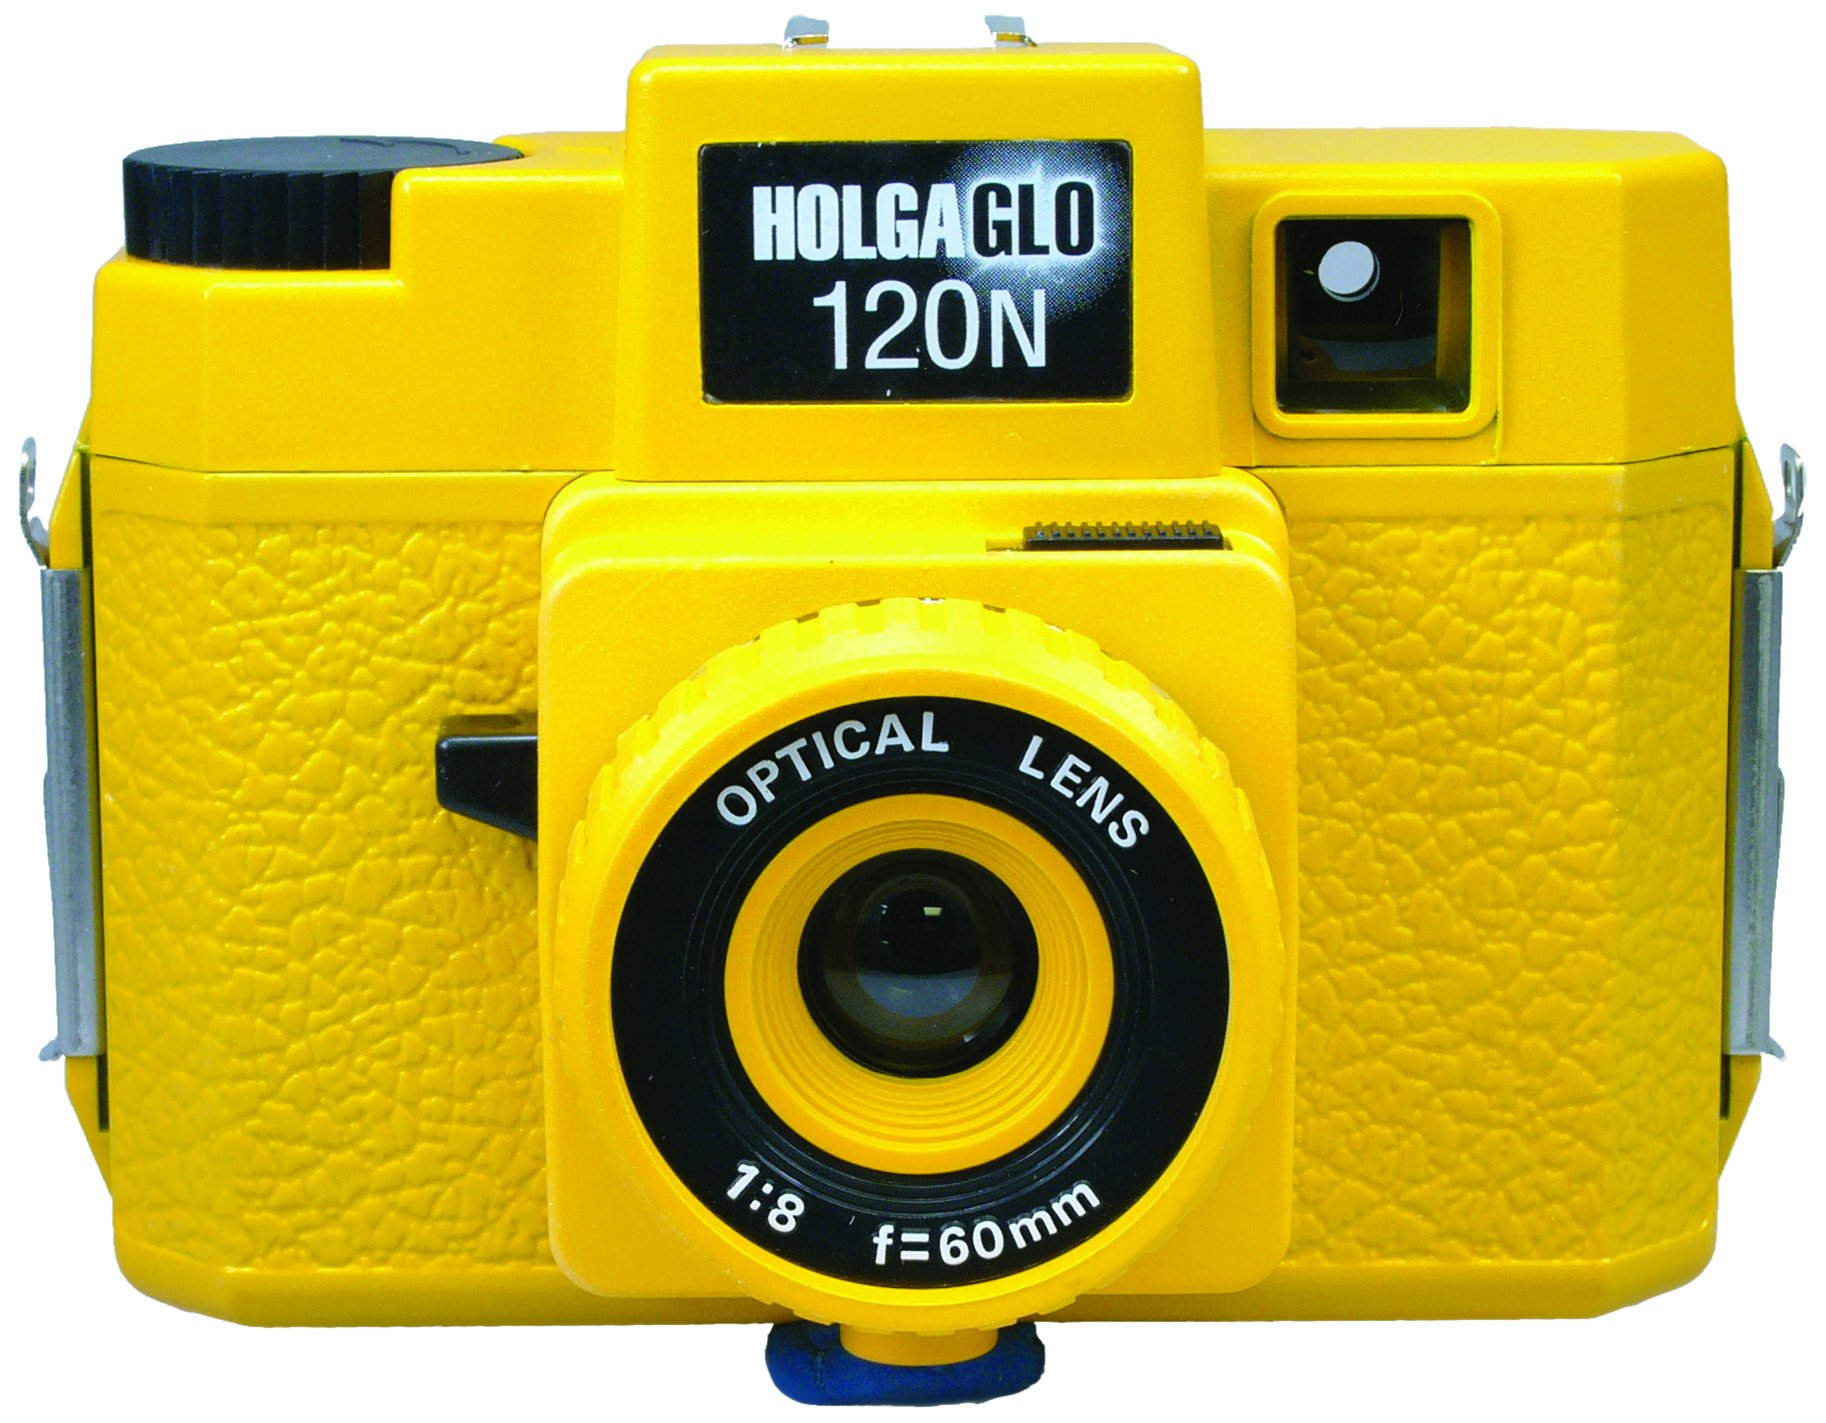 Holga 309120 Holga HOLGAGLO 120N Glow In The Dark Cameras (Solar Yellow) by Holga